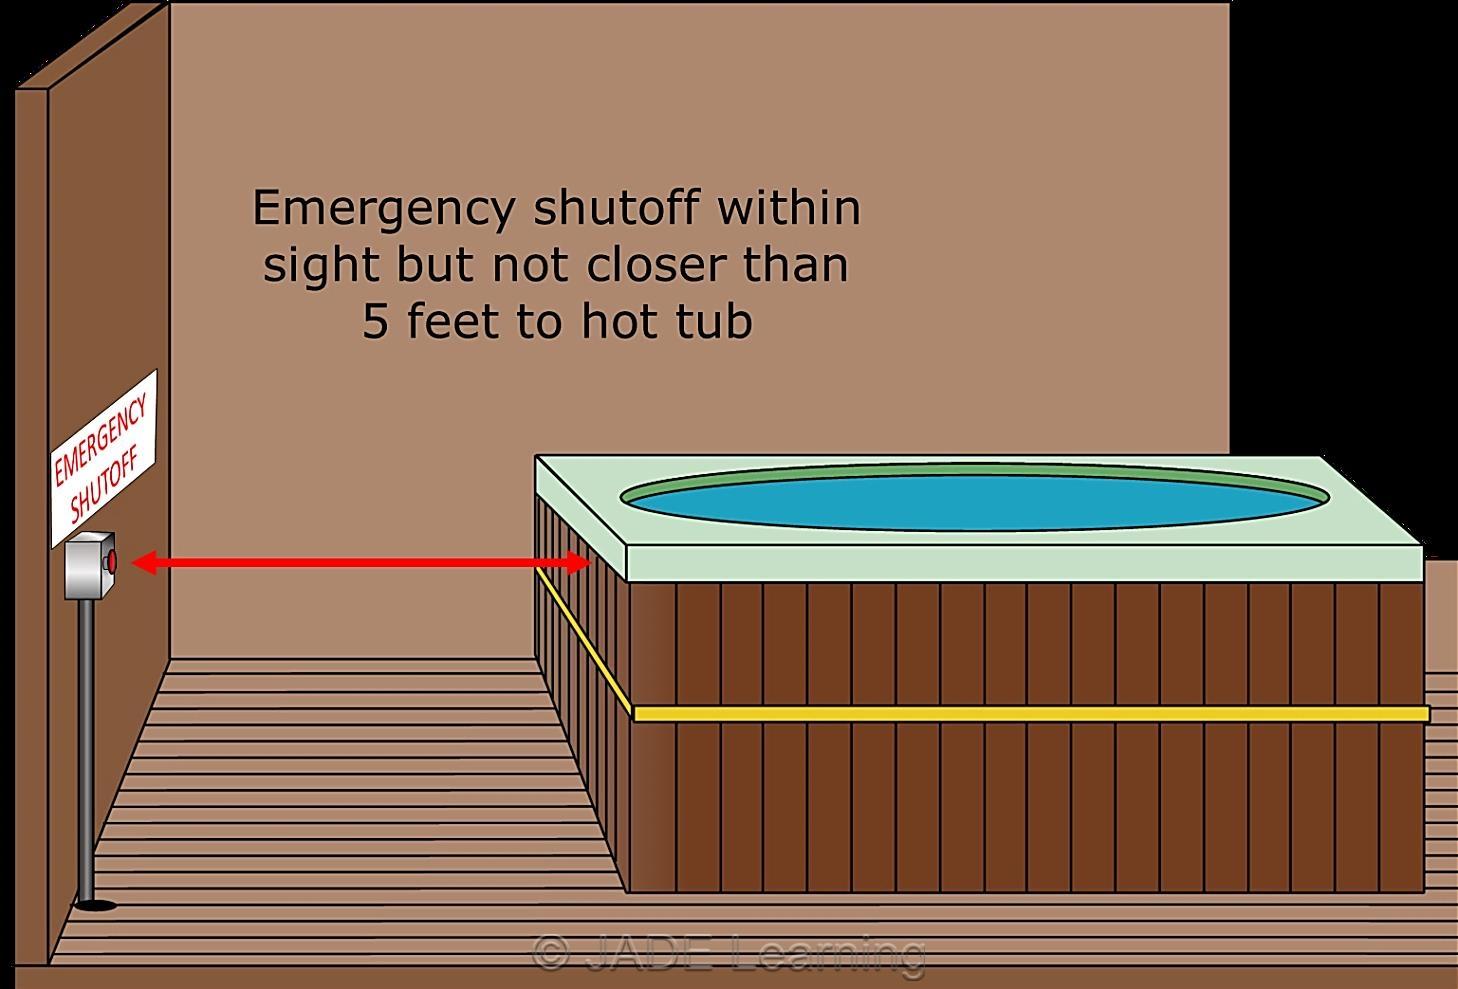 nordic crown ii hot tub manual